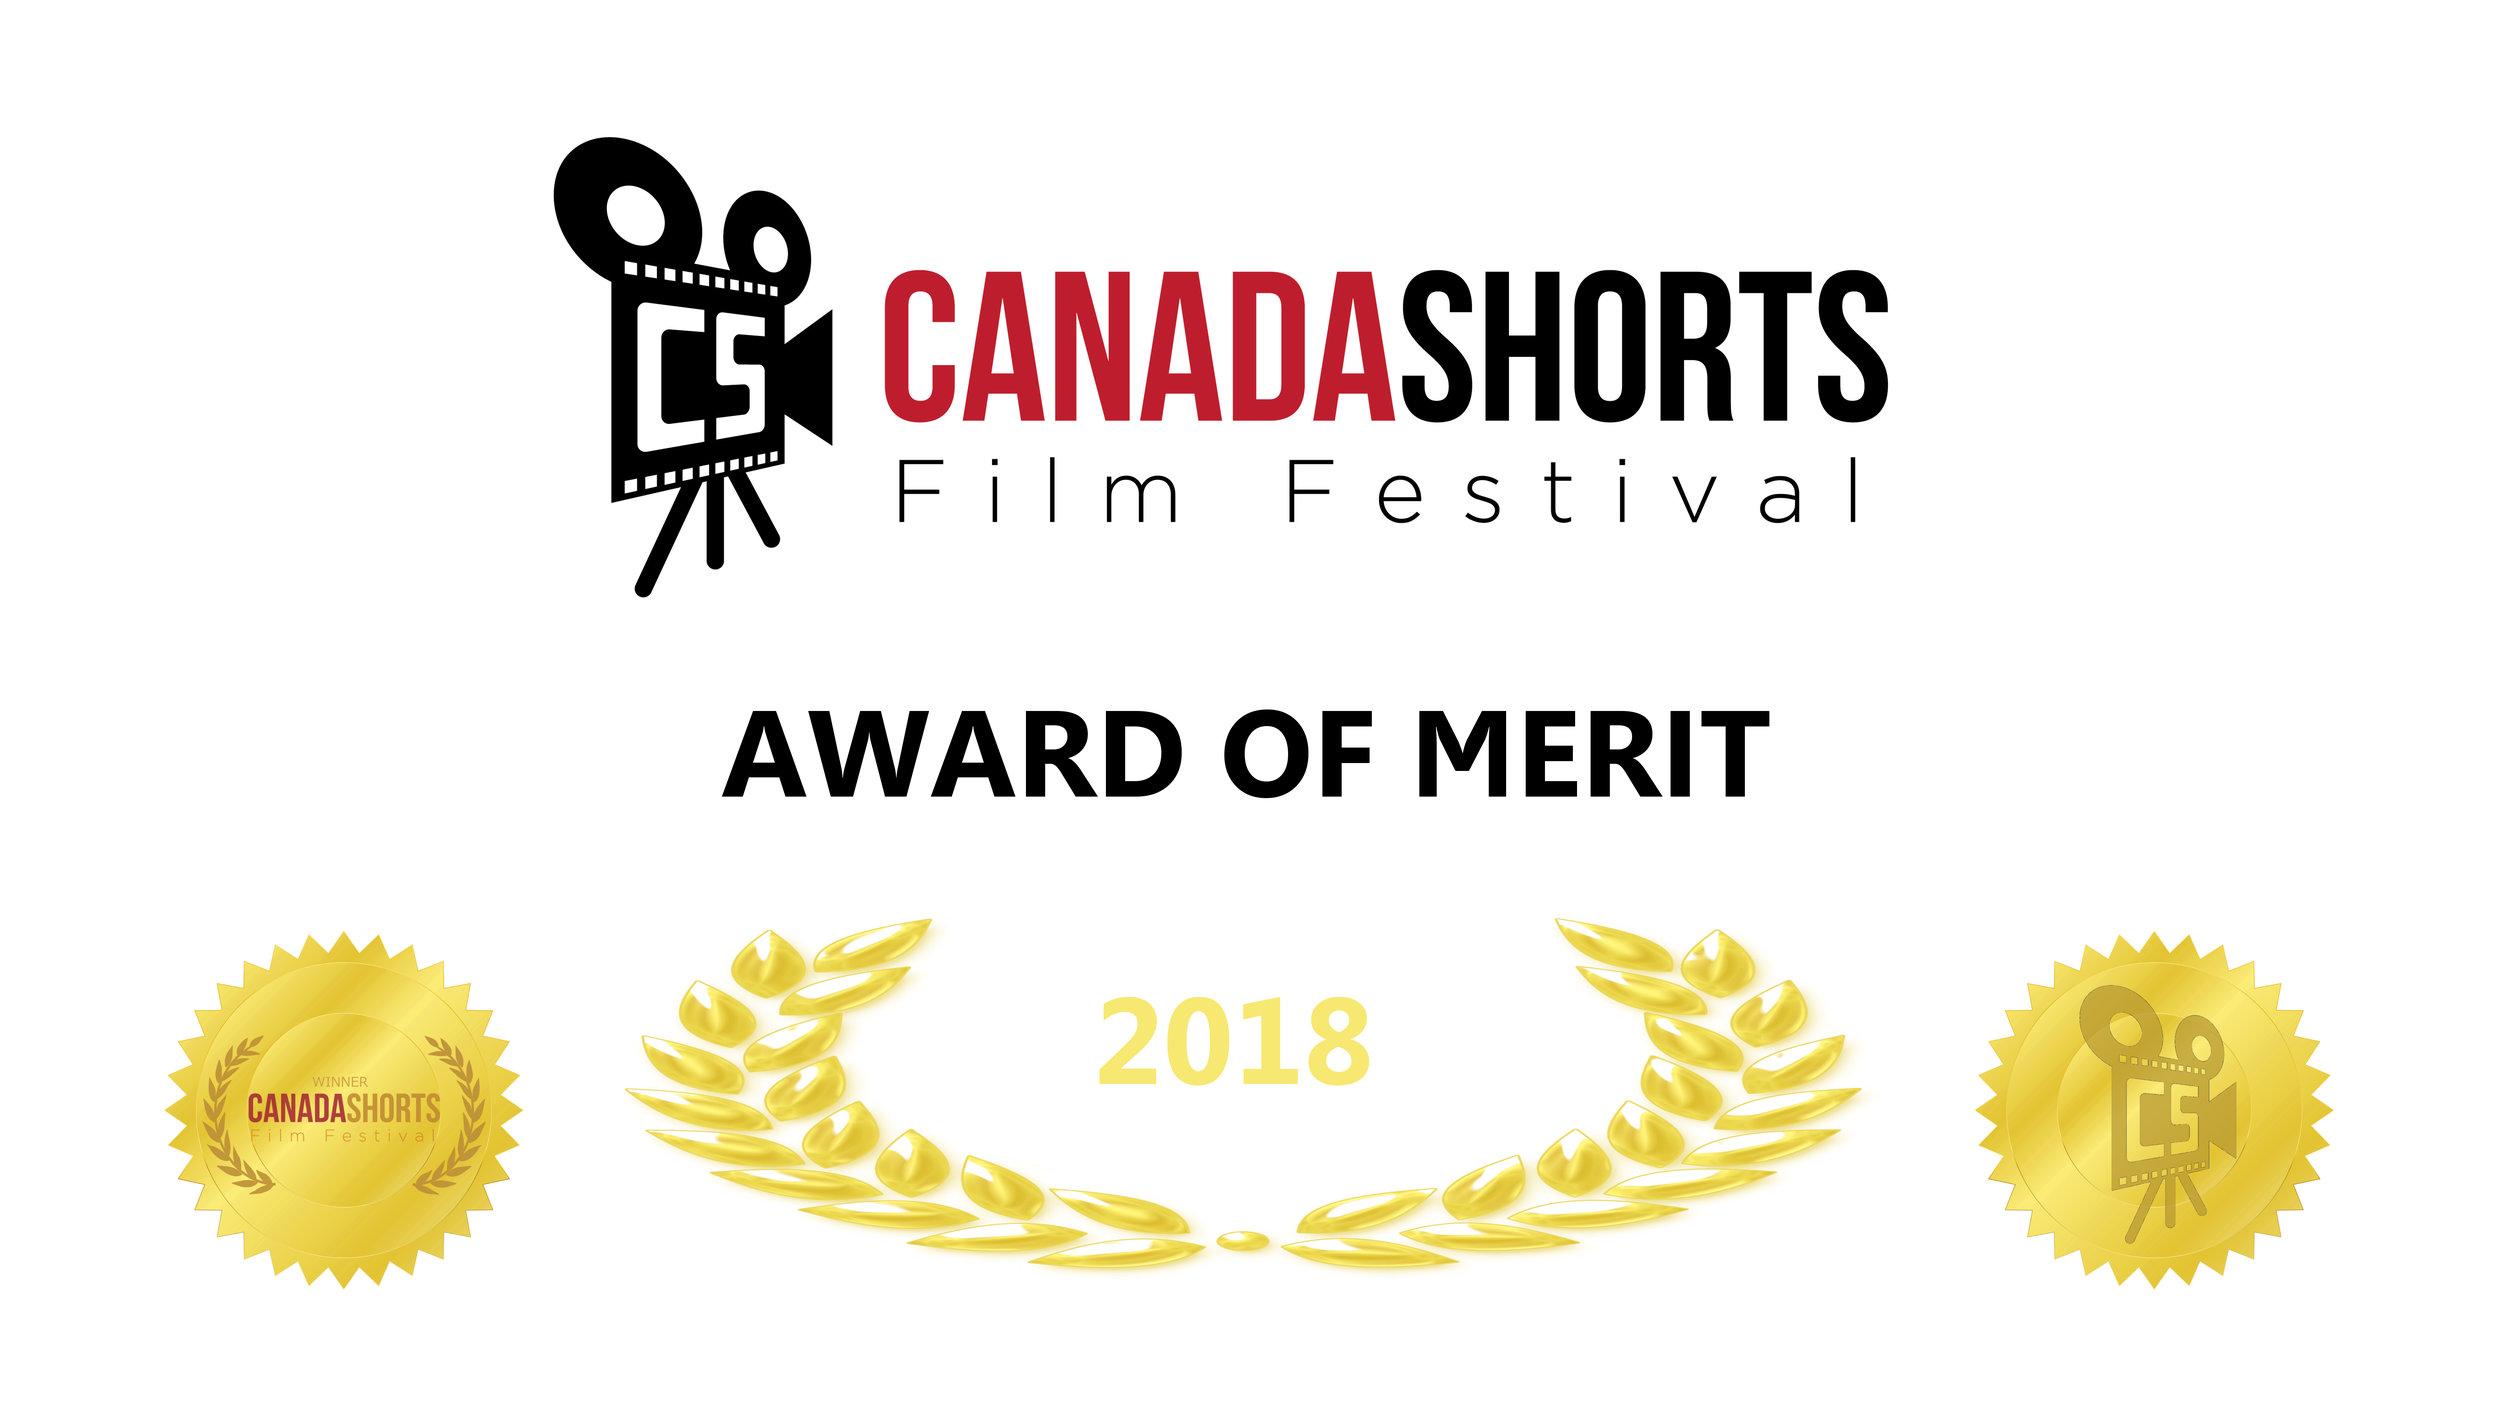 Canada Shorts 2018 award of merit certificate copy.jpg